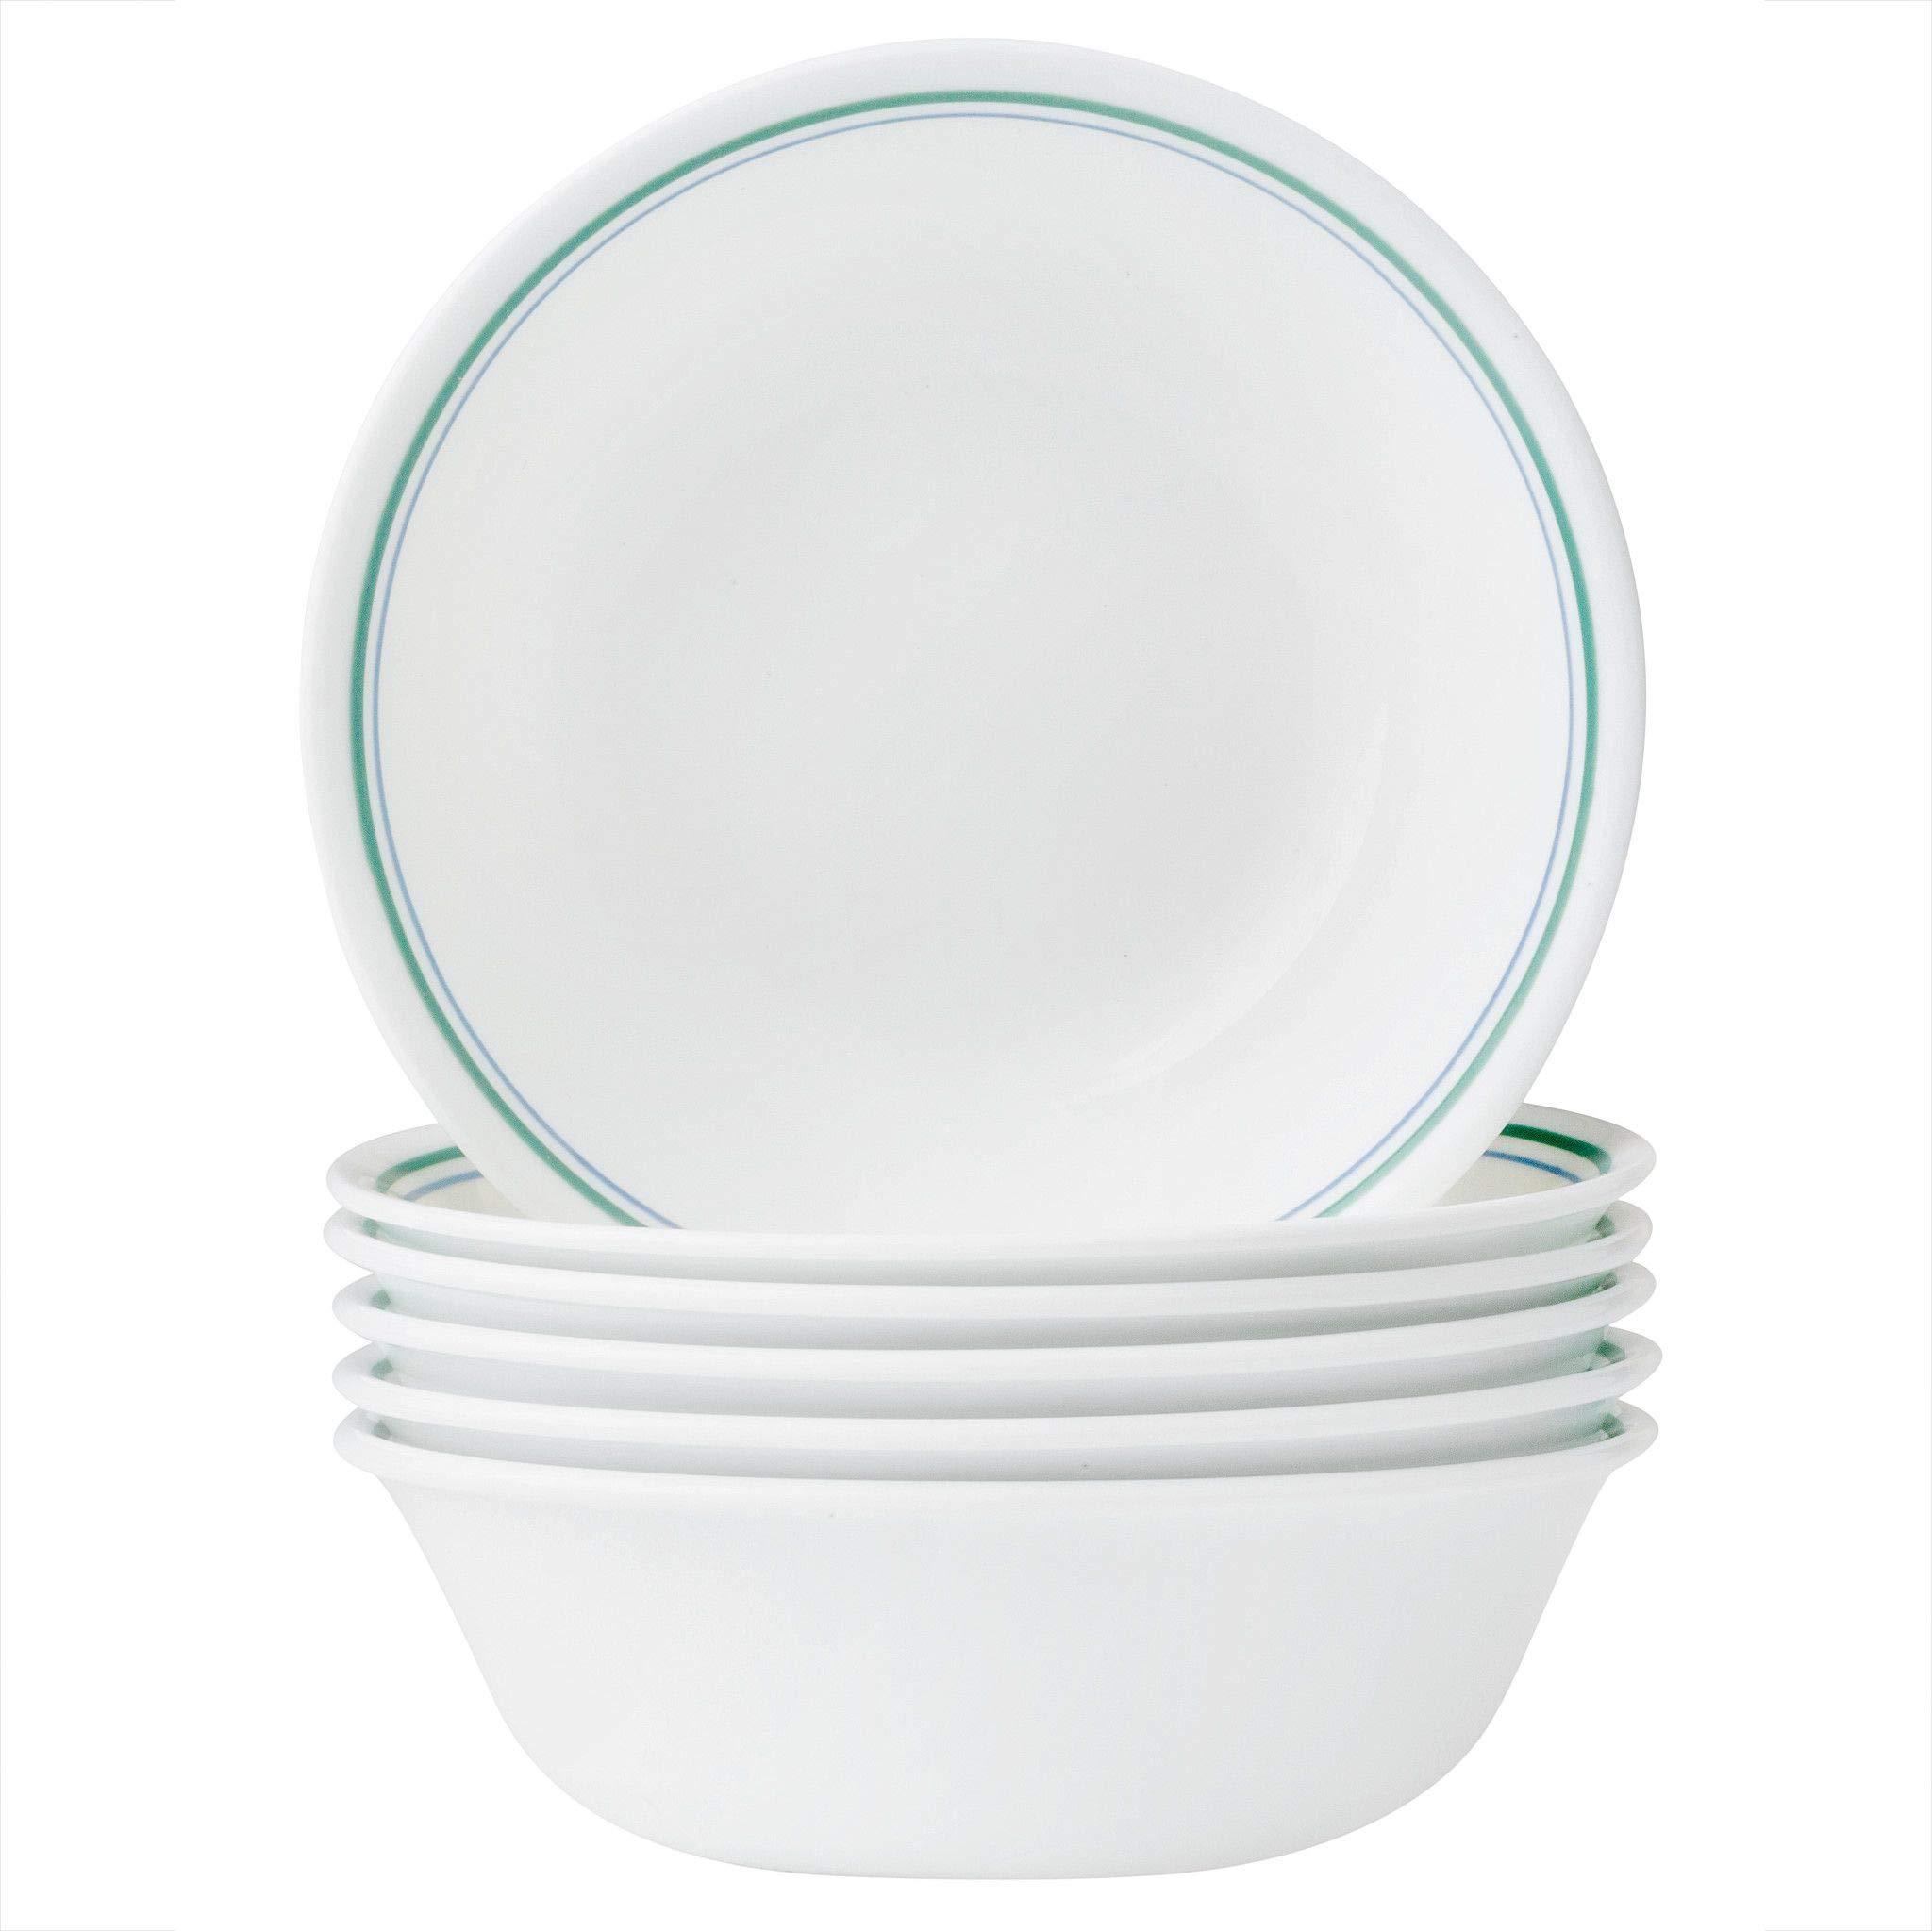 Corelle Livingware Bowls, Country Cottage, Set of 6